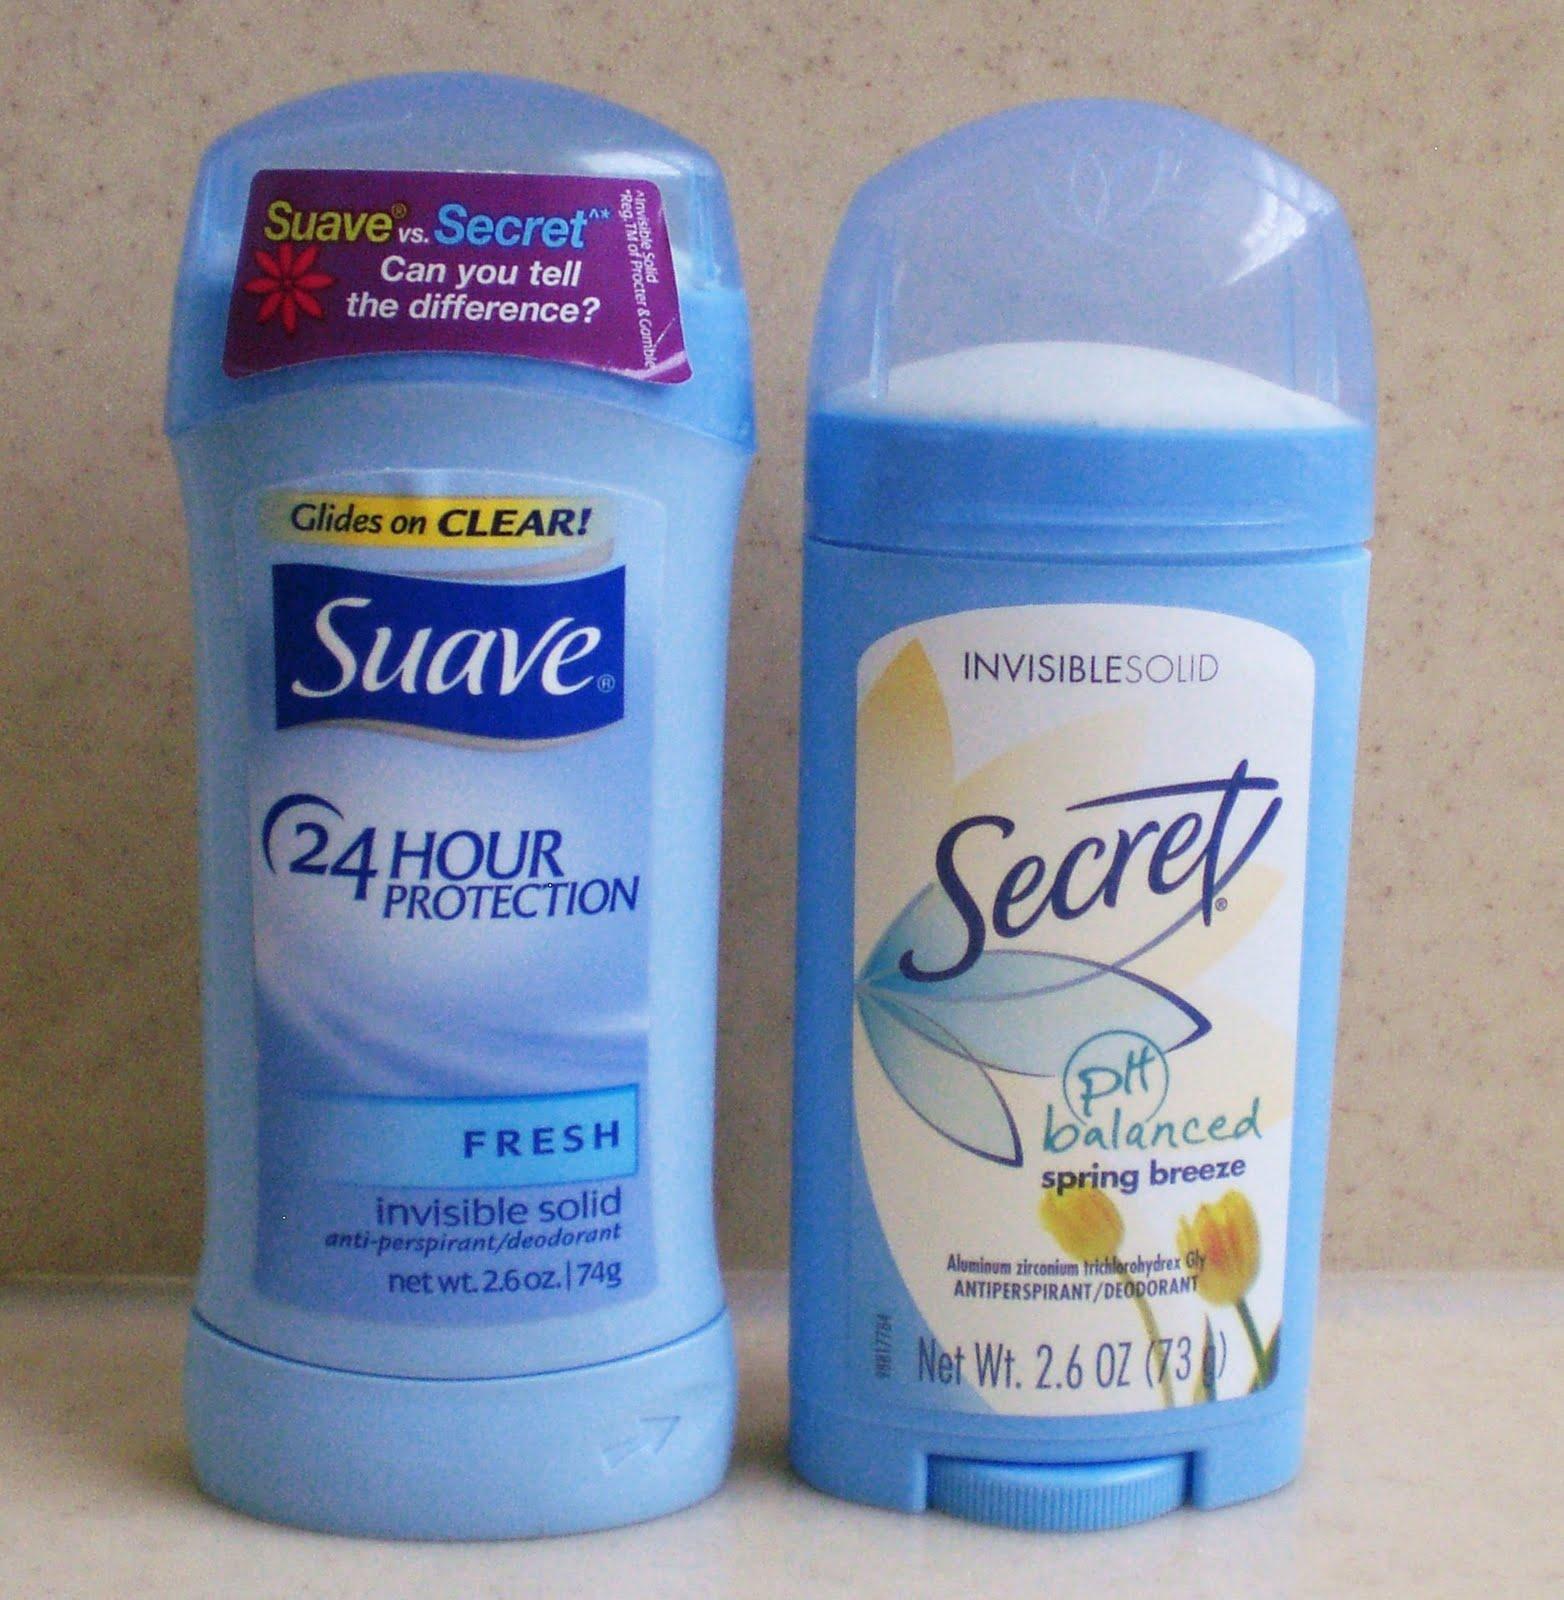 GLAMBO: Suave vs  Secret Challenge